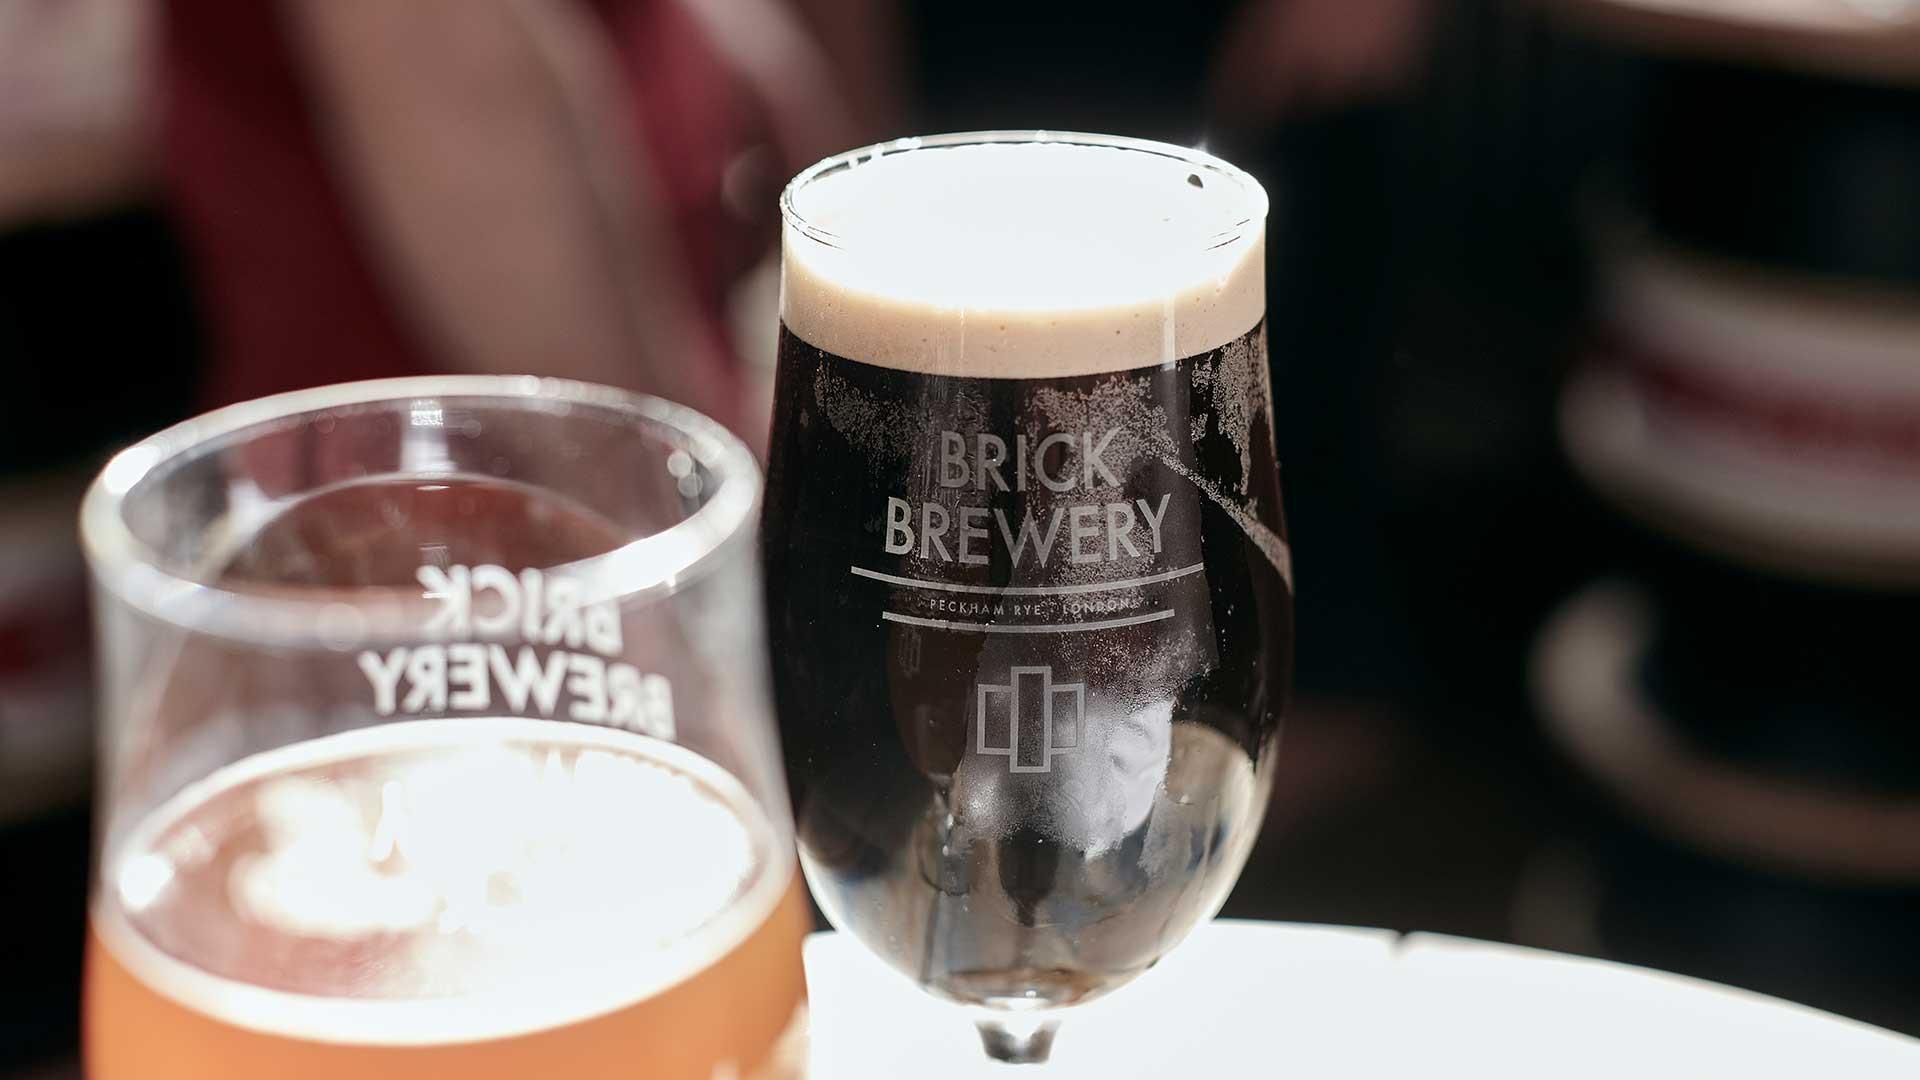 A pint of Blenheim Black beer in Brick Brewery, Peckham